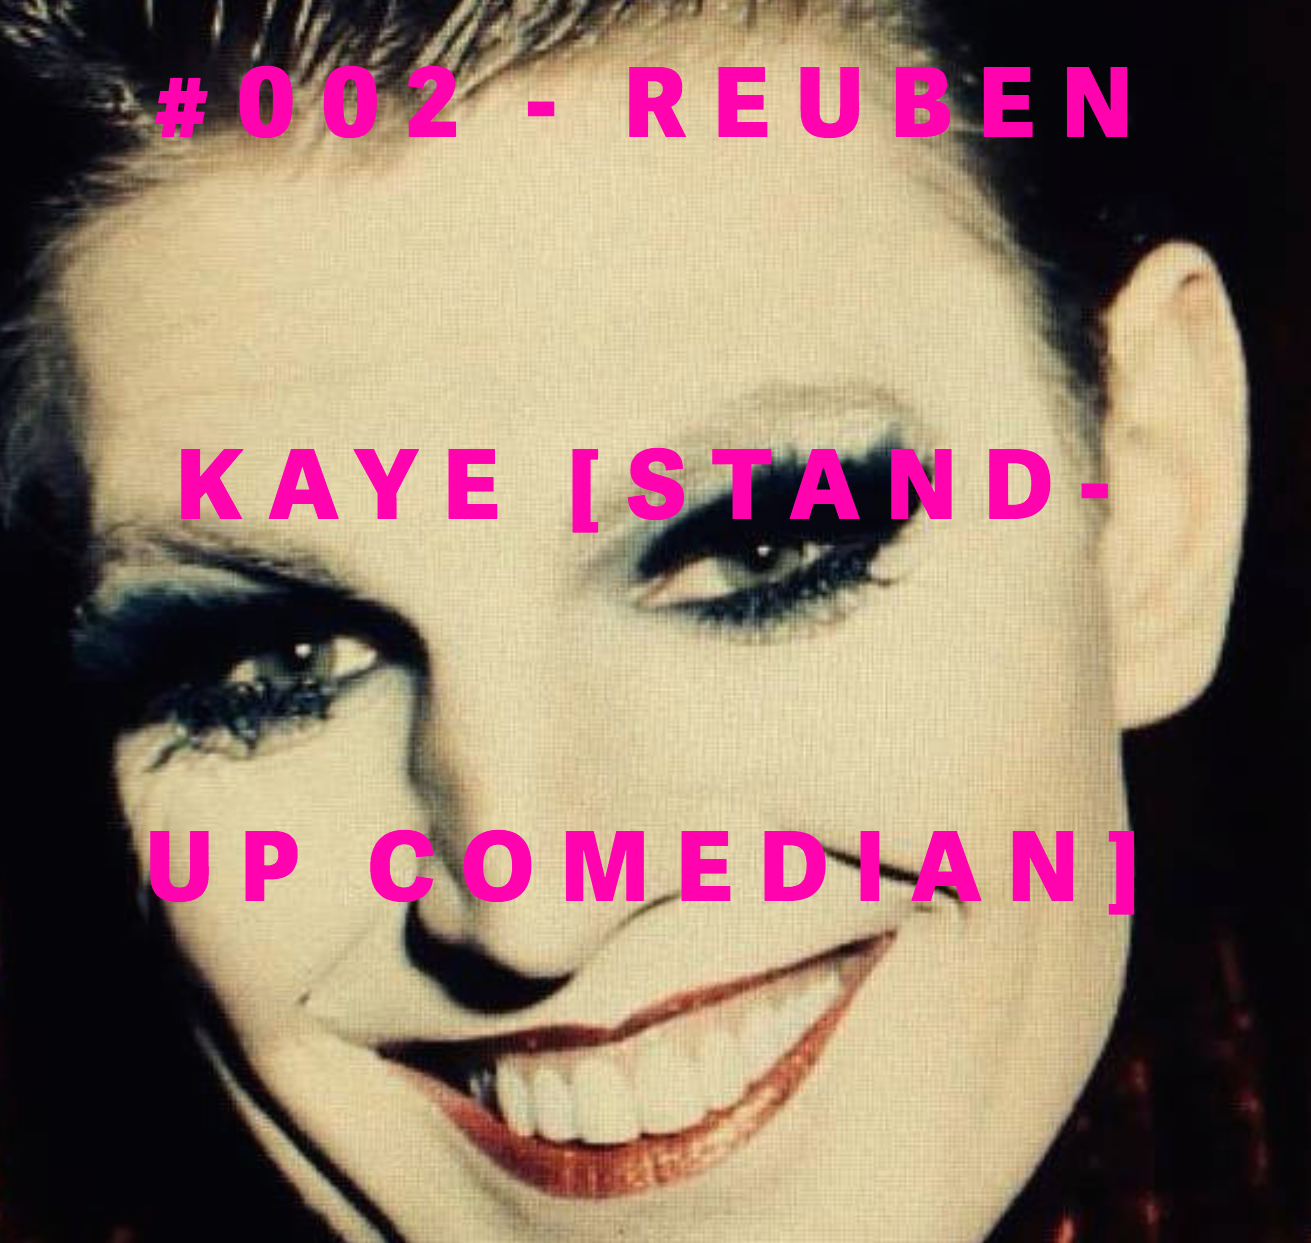 REUBEN KAYE  #002-Stand Up Comedian